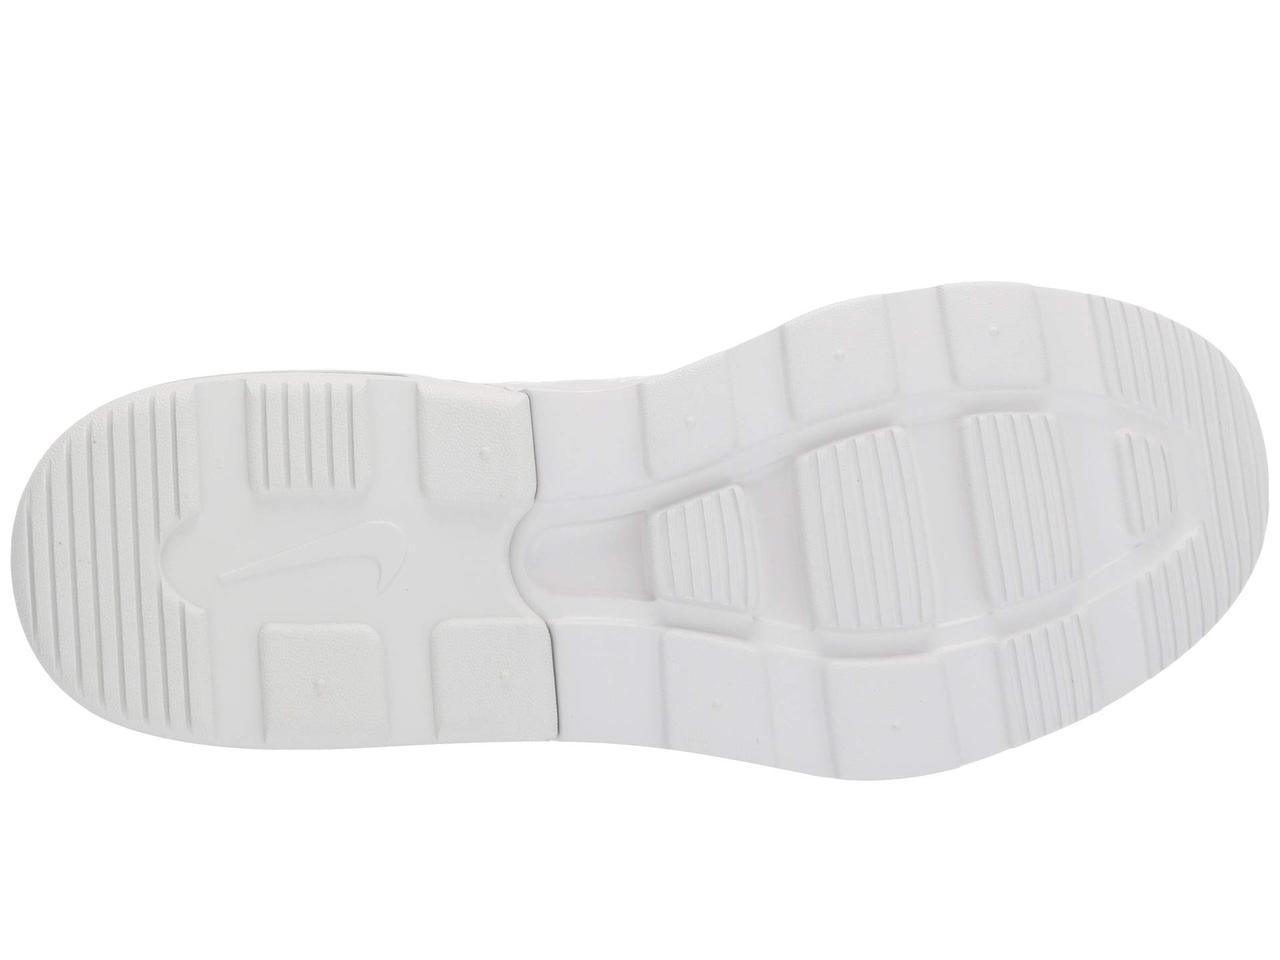 best authentic a91bc ac6bb ... Кроссовки Кеды (Оригинал) Nike Air Max Motion 2 Sail Black Platinum ...